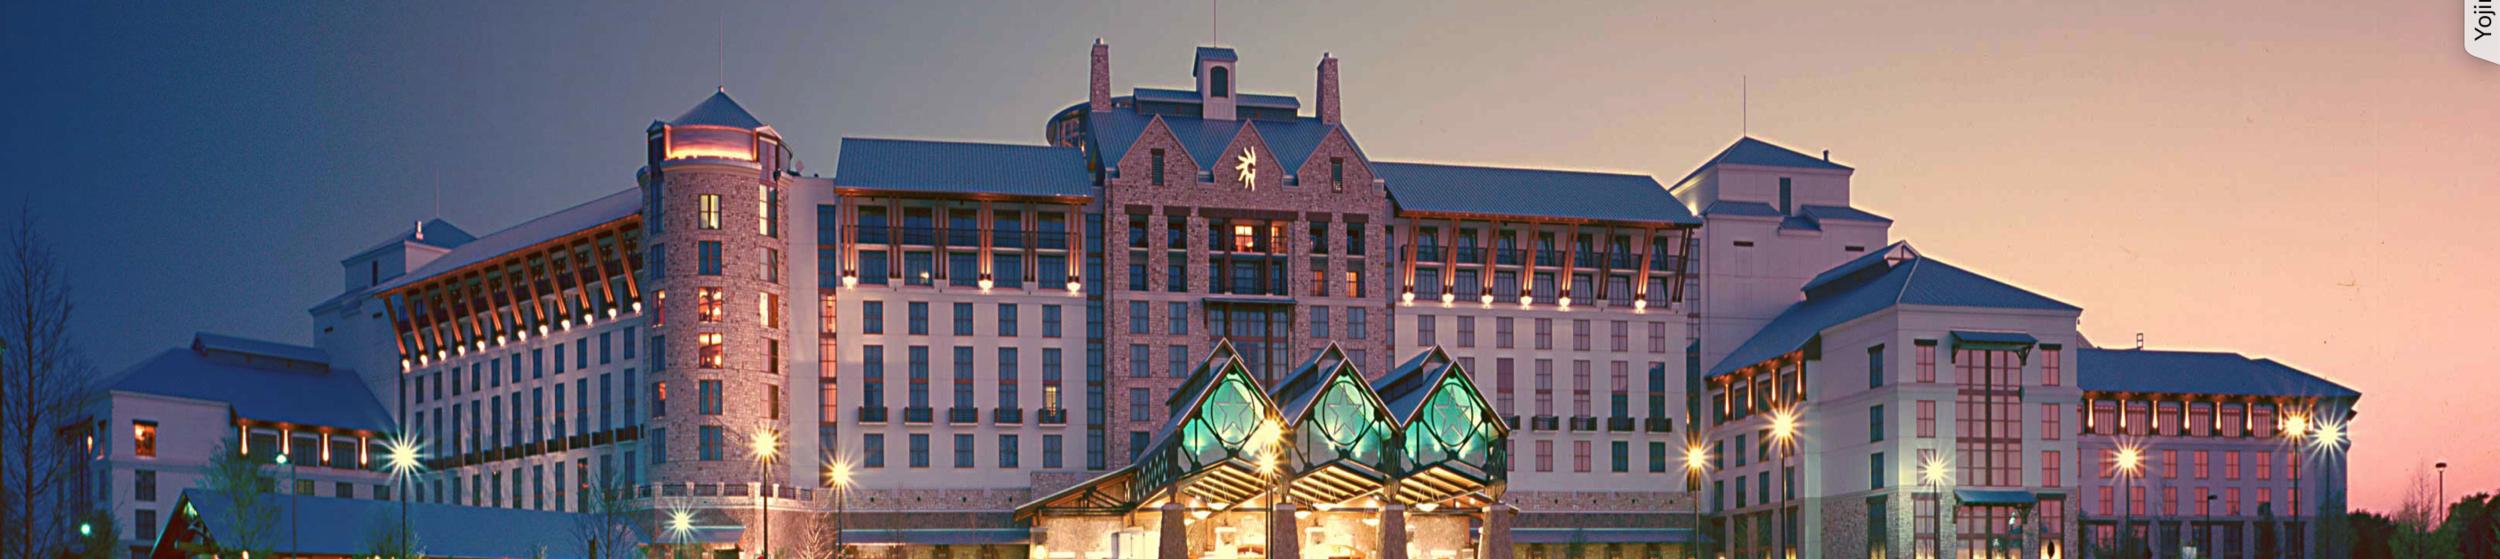 Gaylor Texan Resort, site of the FileMaker Developer's Conference, 2018